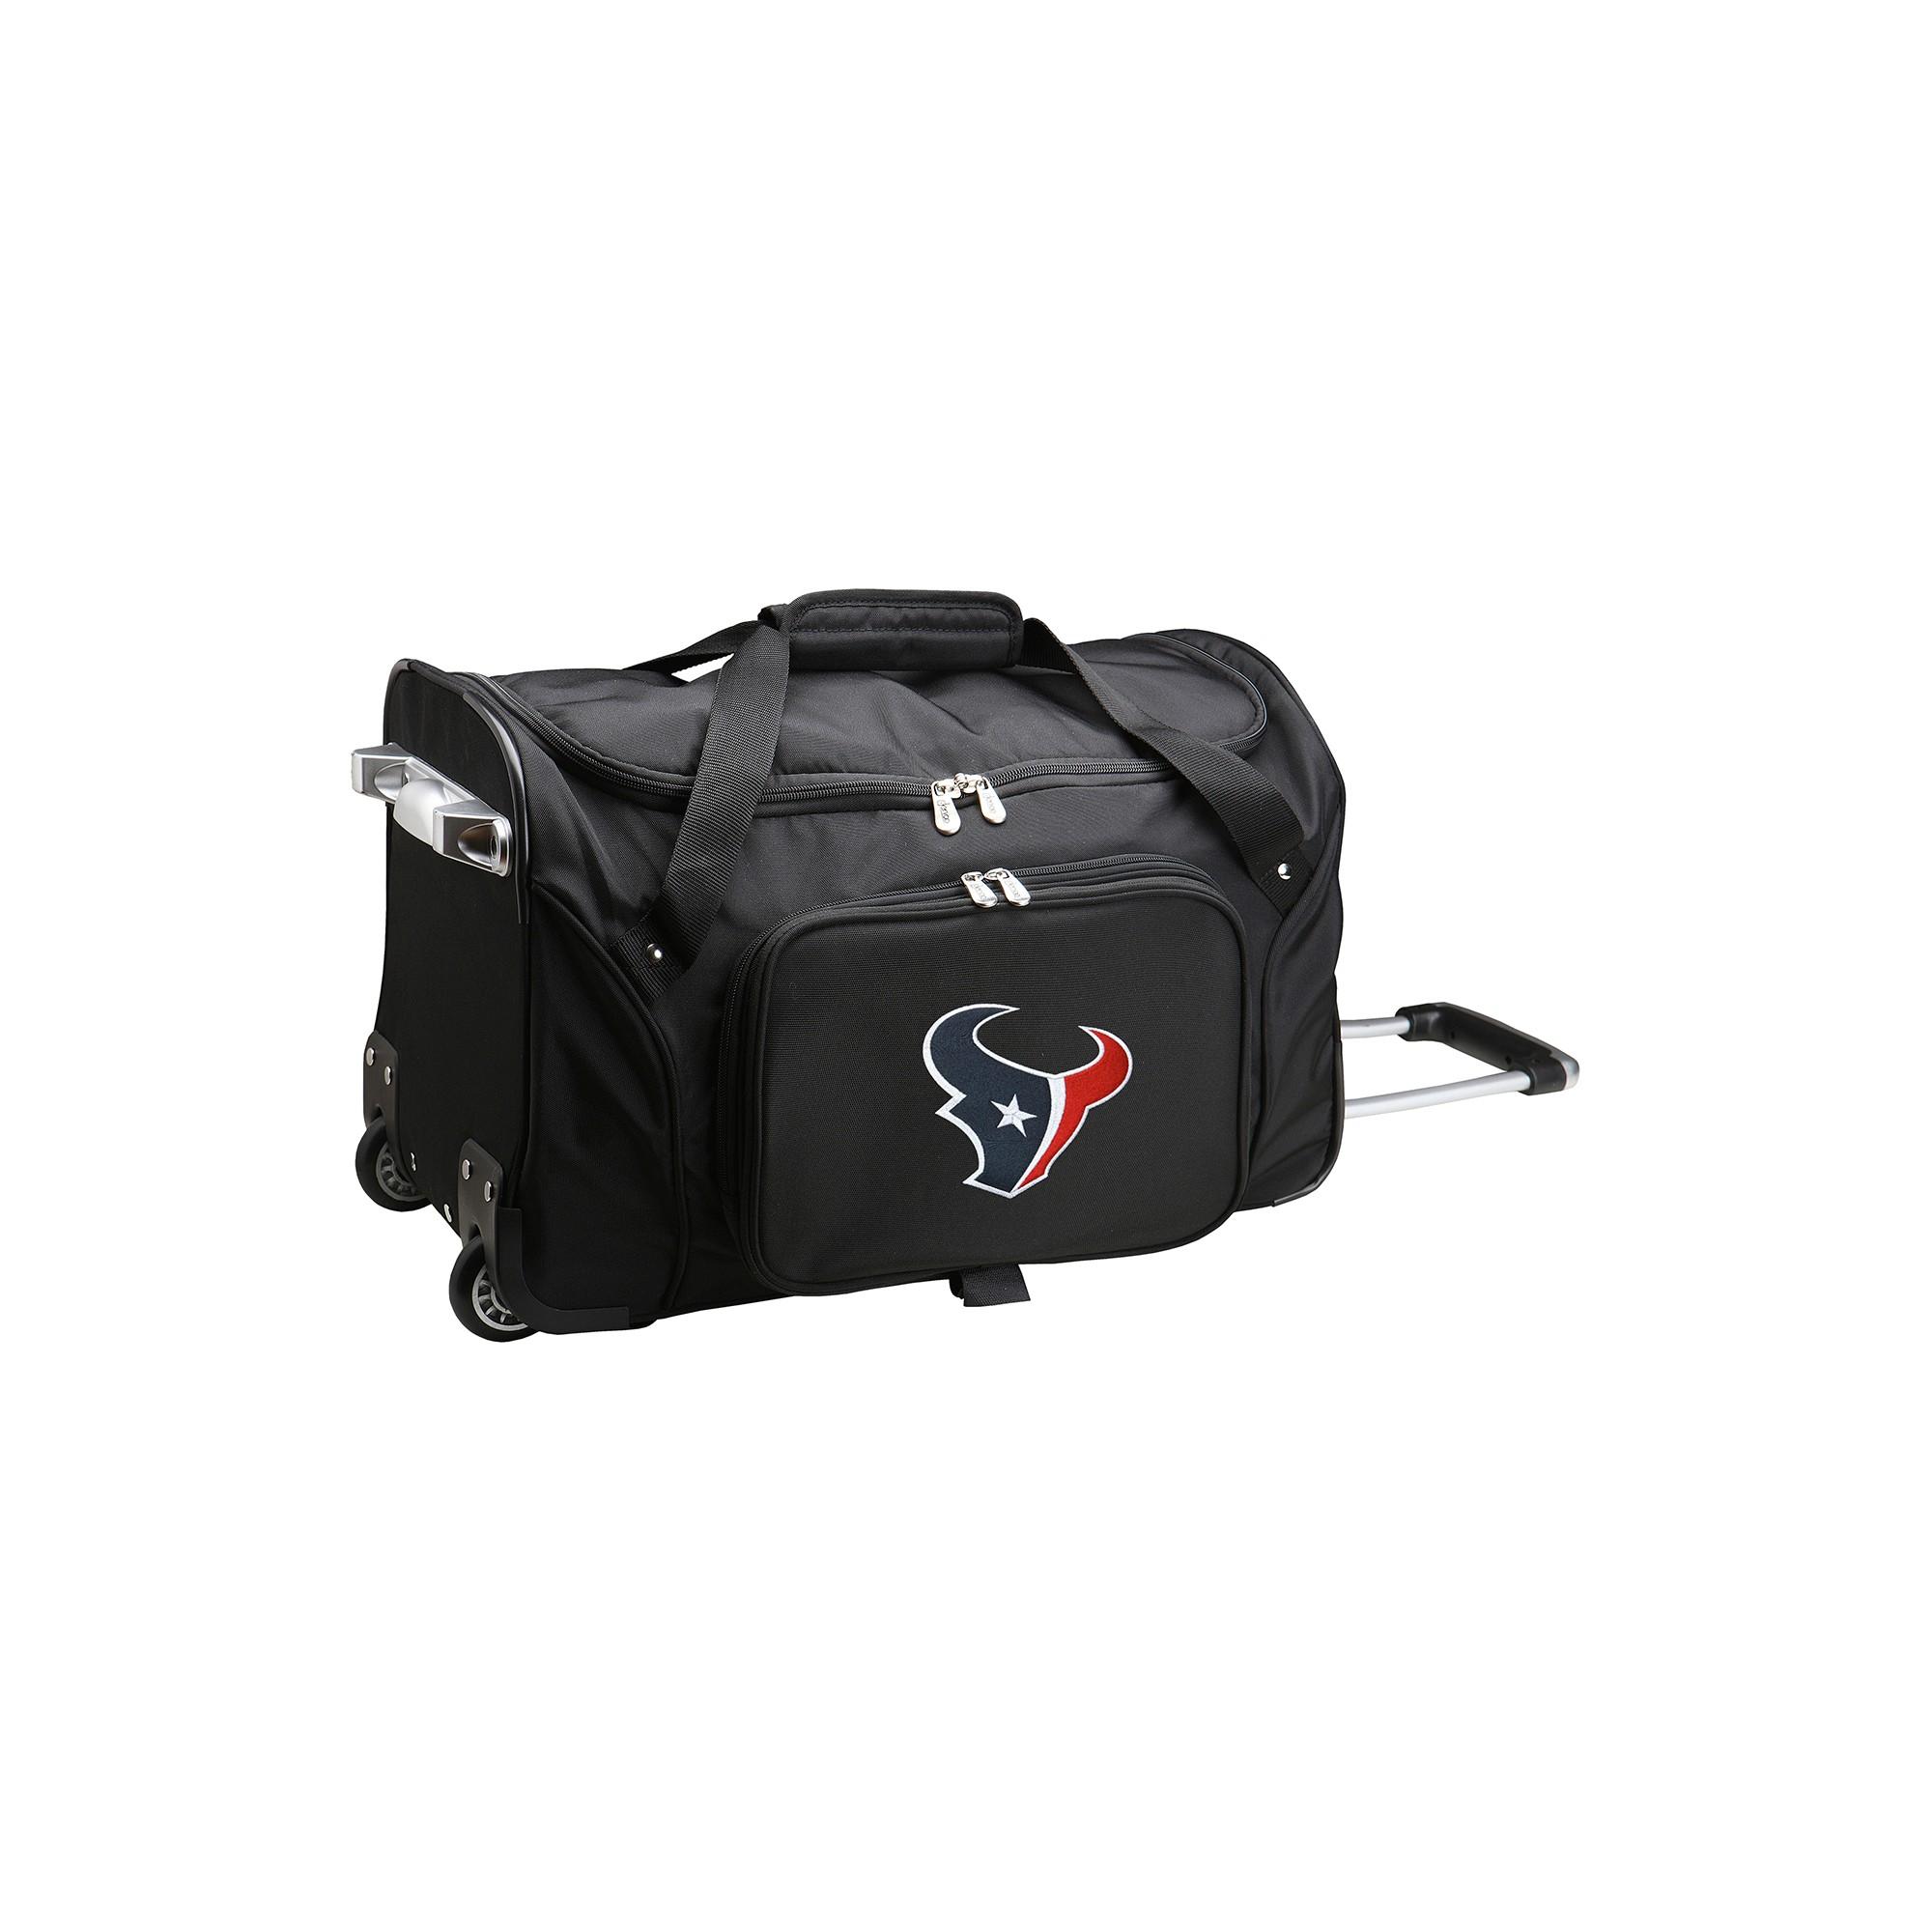 Nfl Houston Texans Mojo 22 Rolling Duffle Bag